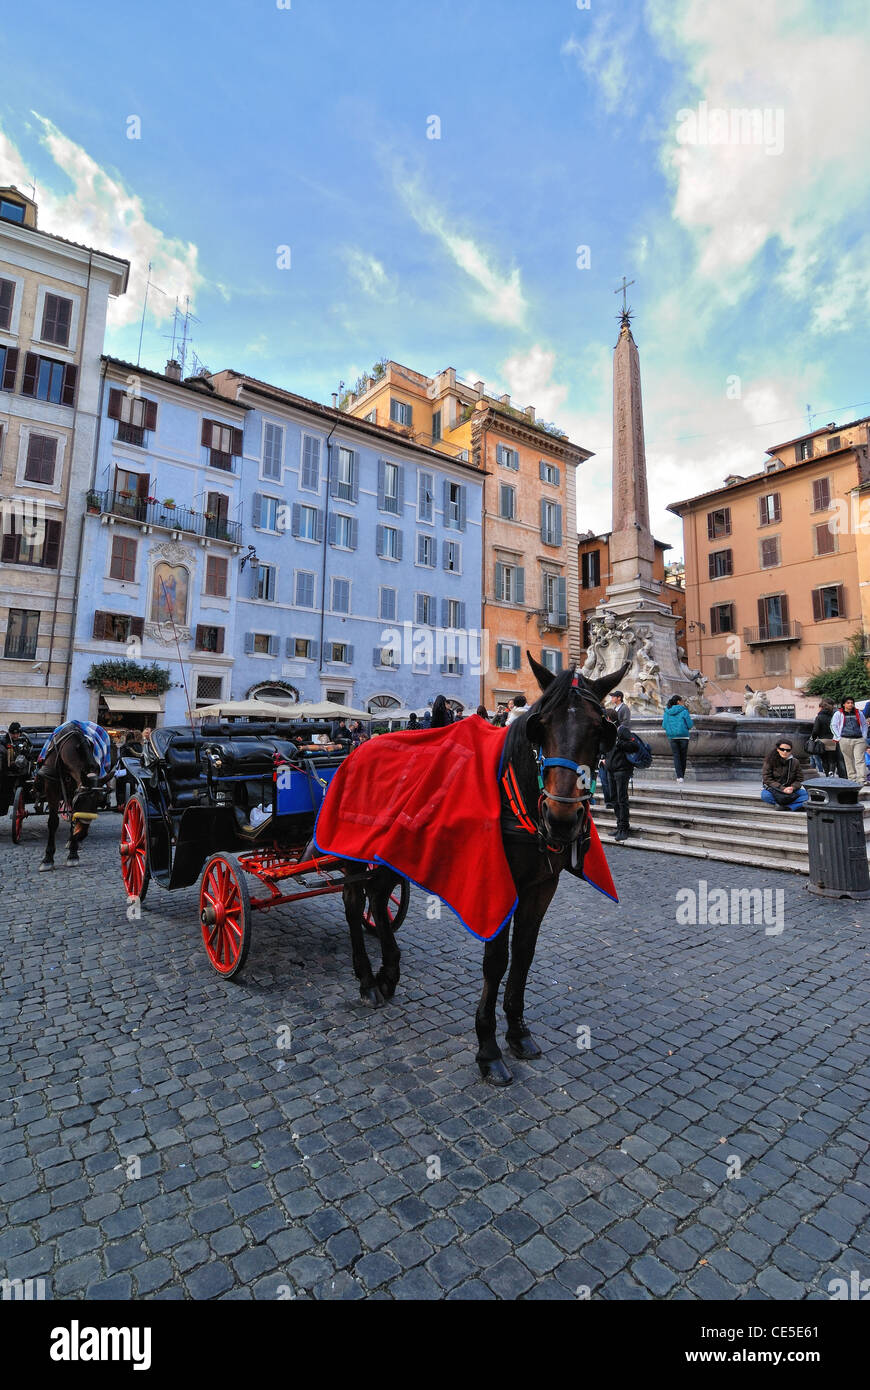 italia roma piazza del pantheon obelisco egitto ramesse fontana carrozza cavallo - Stock Image